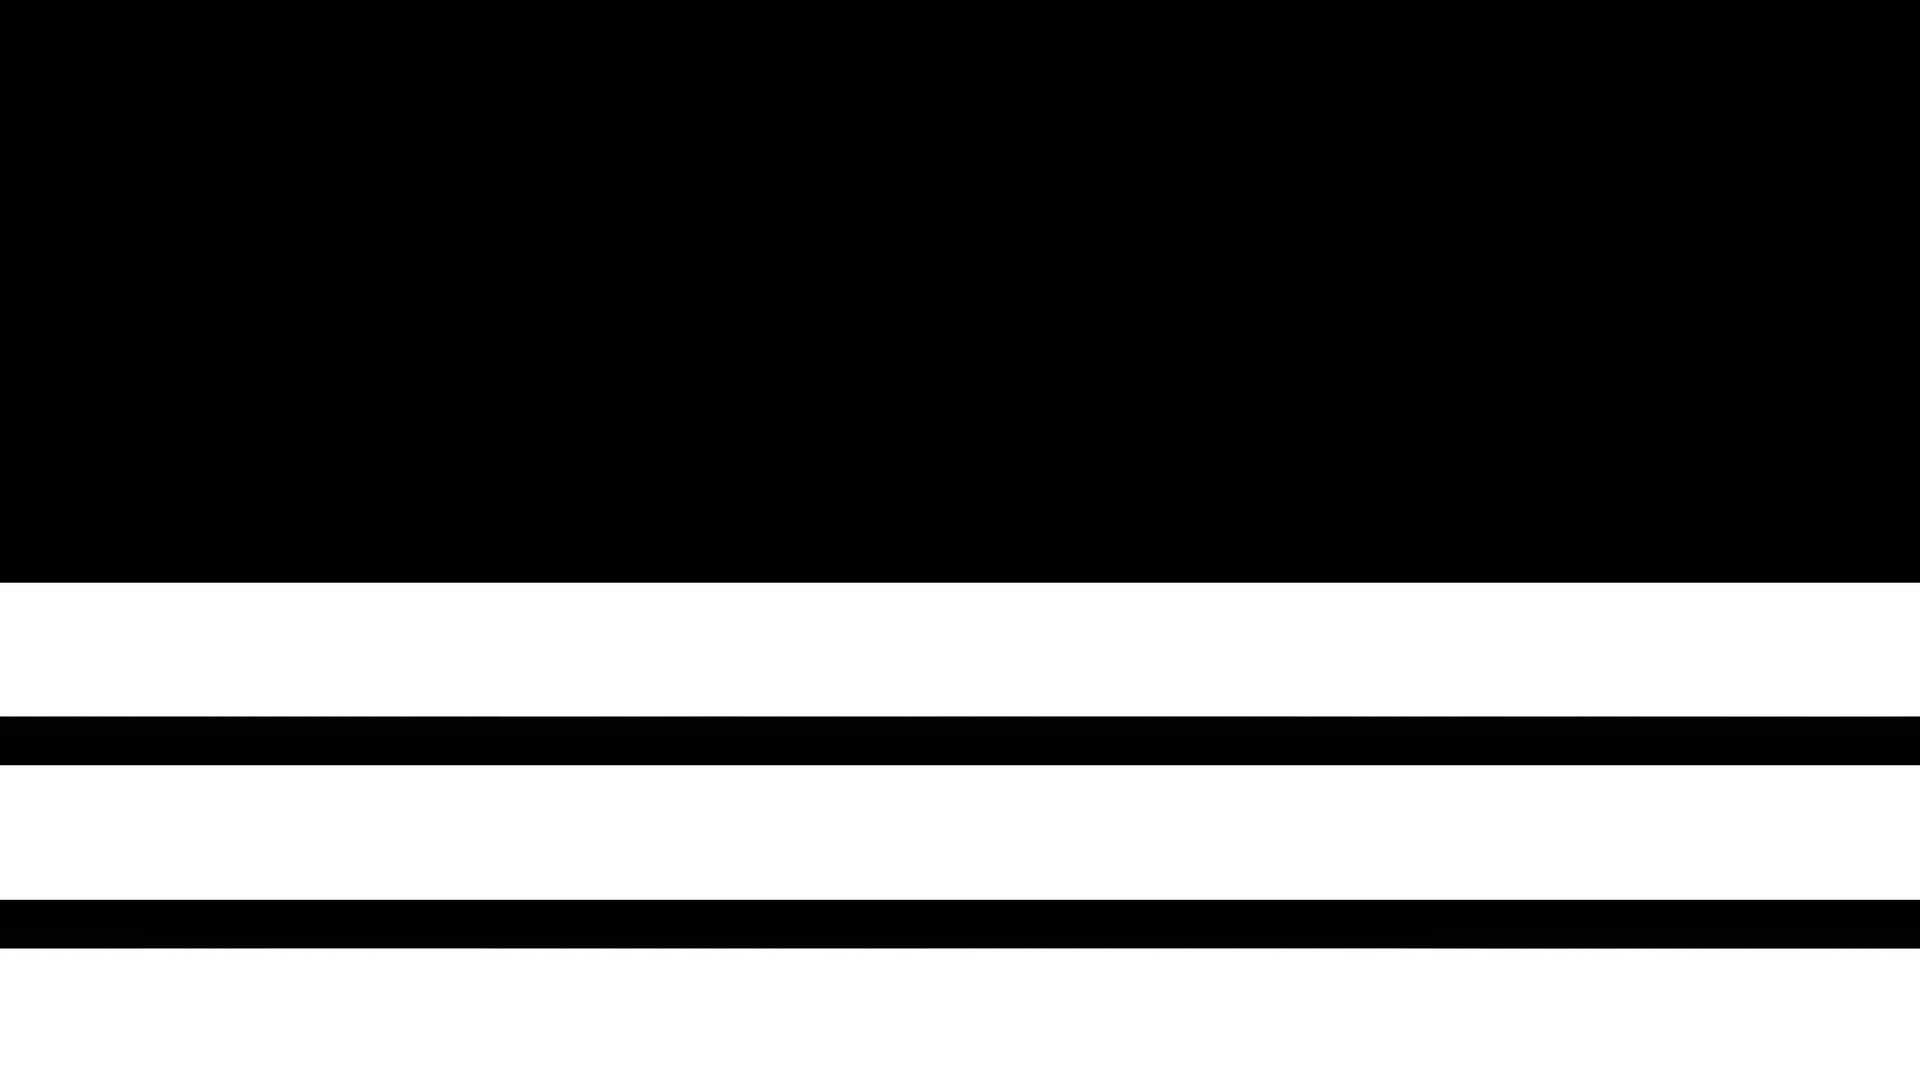 Minimalistic Stripes download wallpaper image